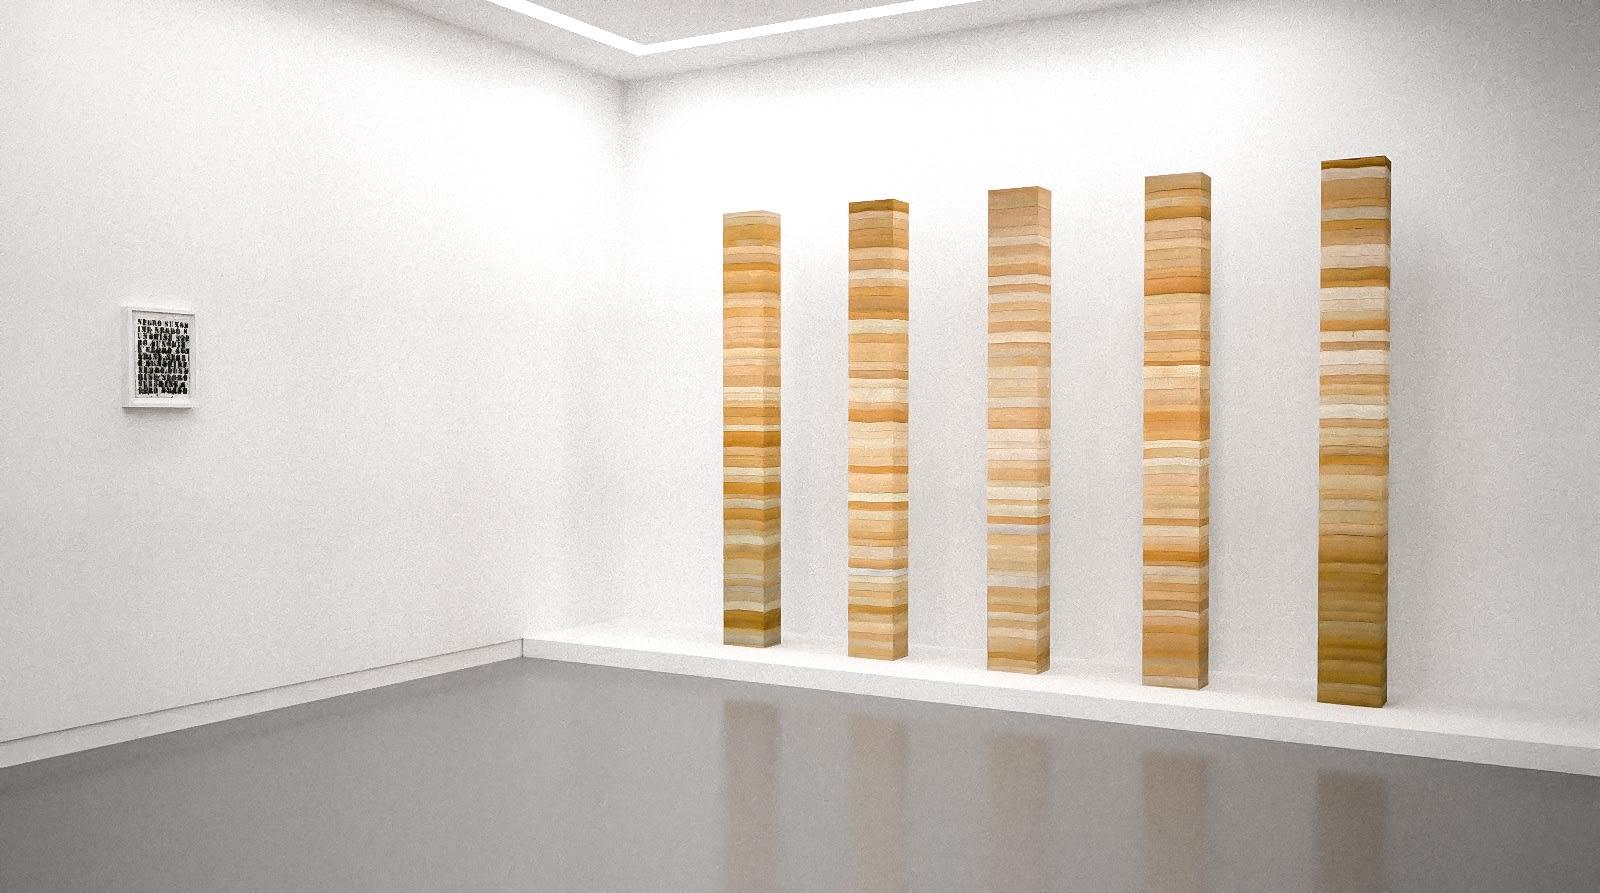 Works by Glenn Ligon and Manish Nai in The Written Word (virtual exhibition view), 2020, Kavi Gupta